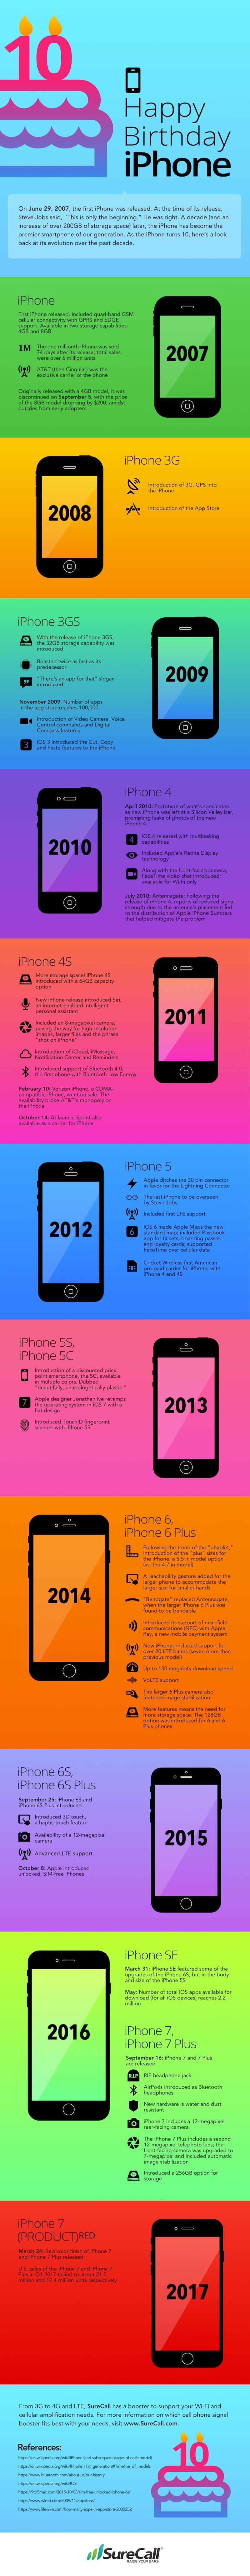 Infographic courtesy of SureCall